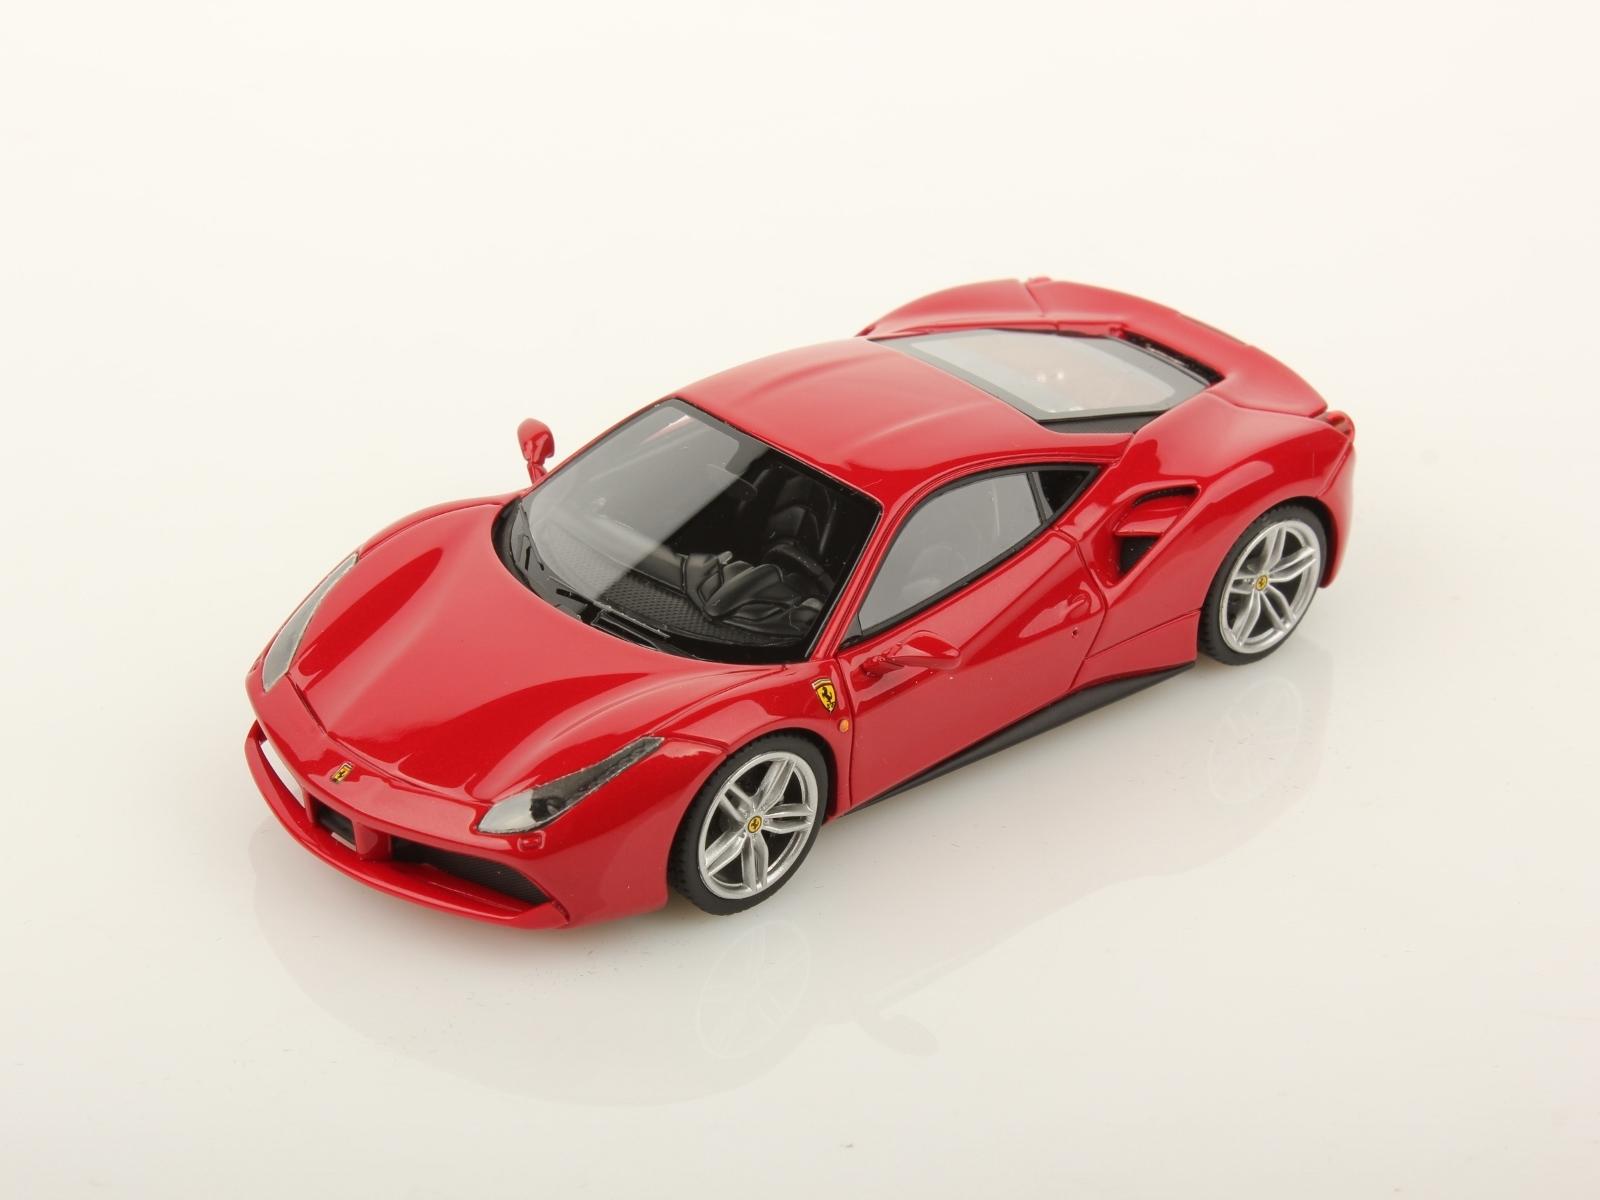 Ferrari 488 Gtb Geneva Motorshow 2015 1 43 Looksmart Models